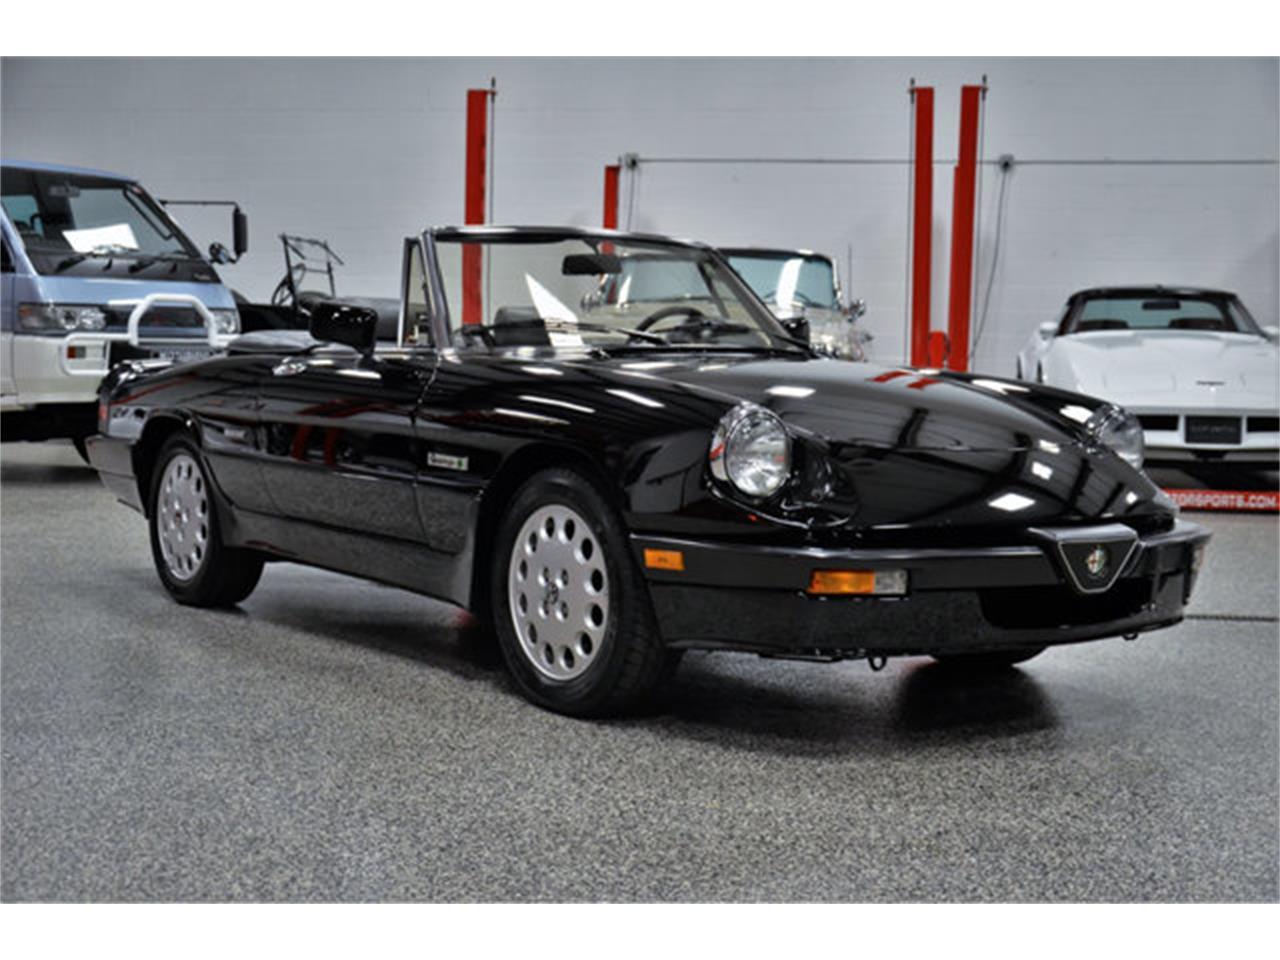 Alfa Romeo Spider For Sale ClassicCarscom CC - 1988 alfa romeo spider for sale